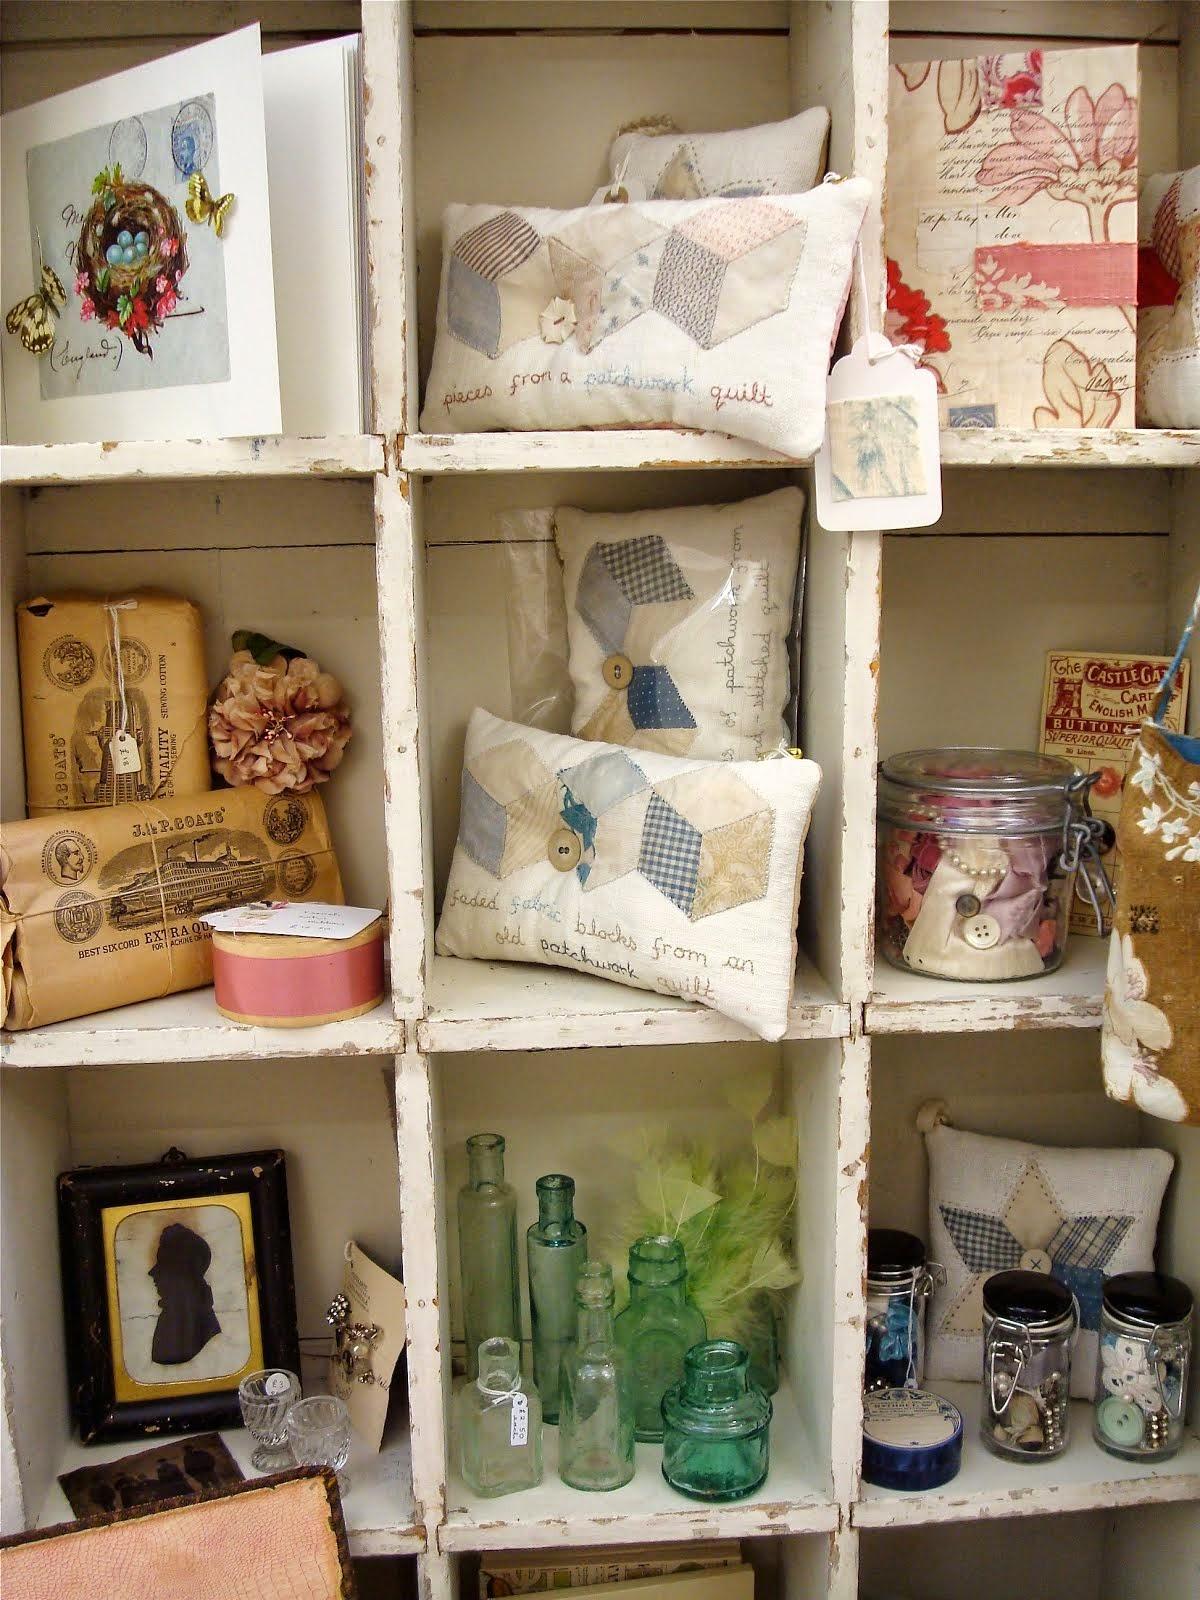 The Decorative Living Fair